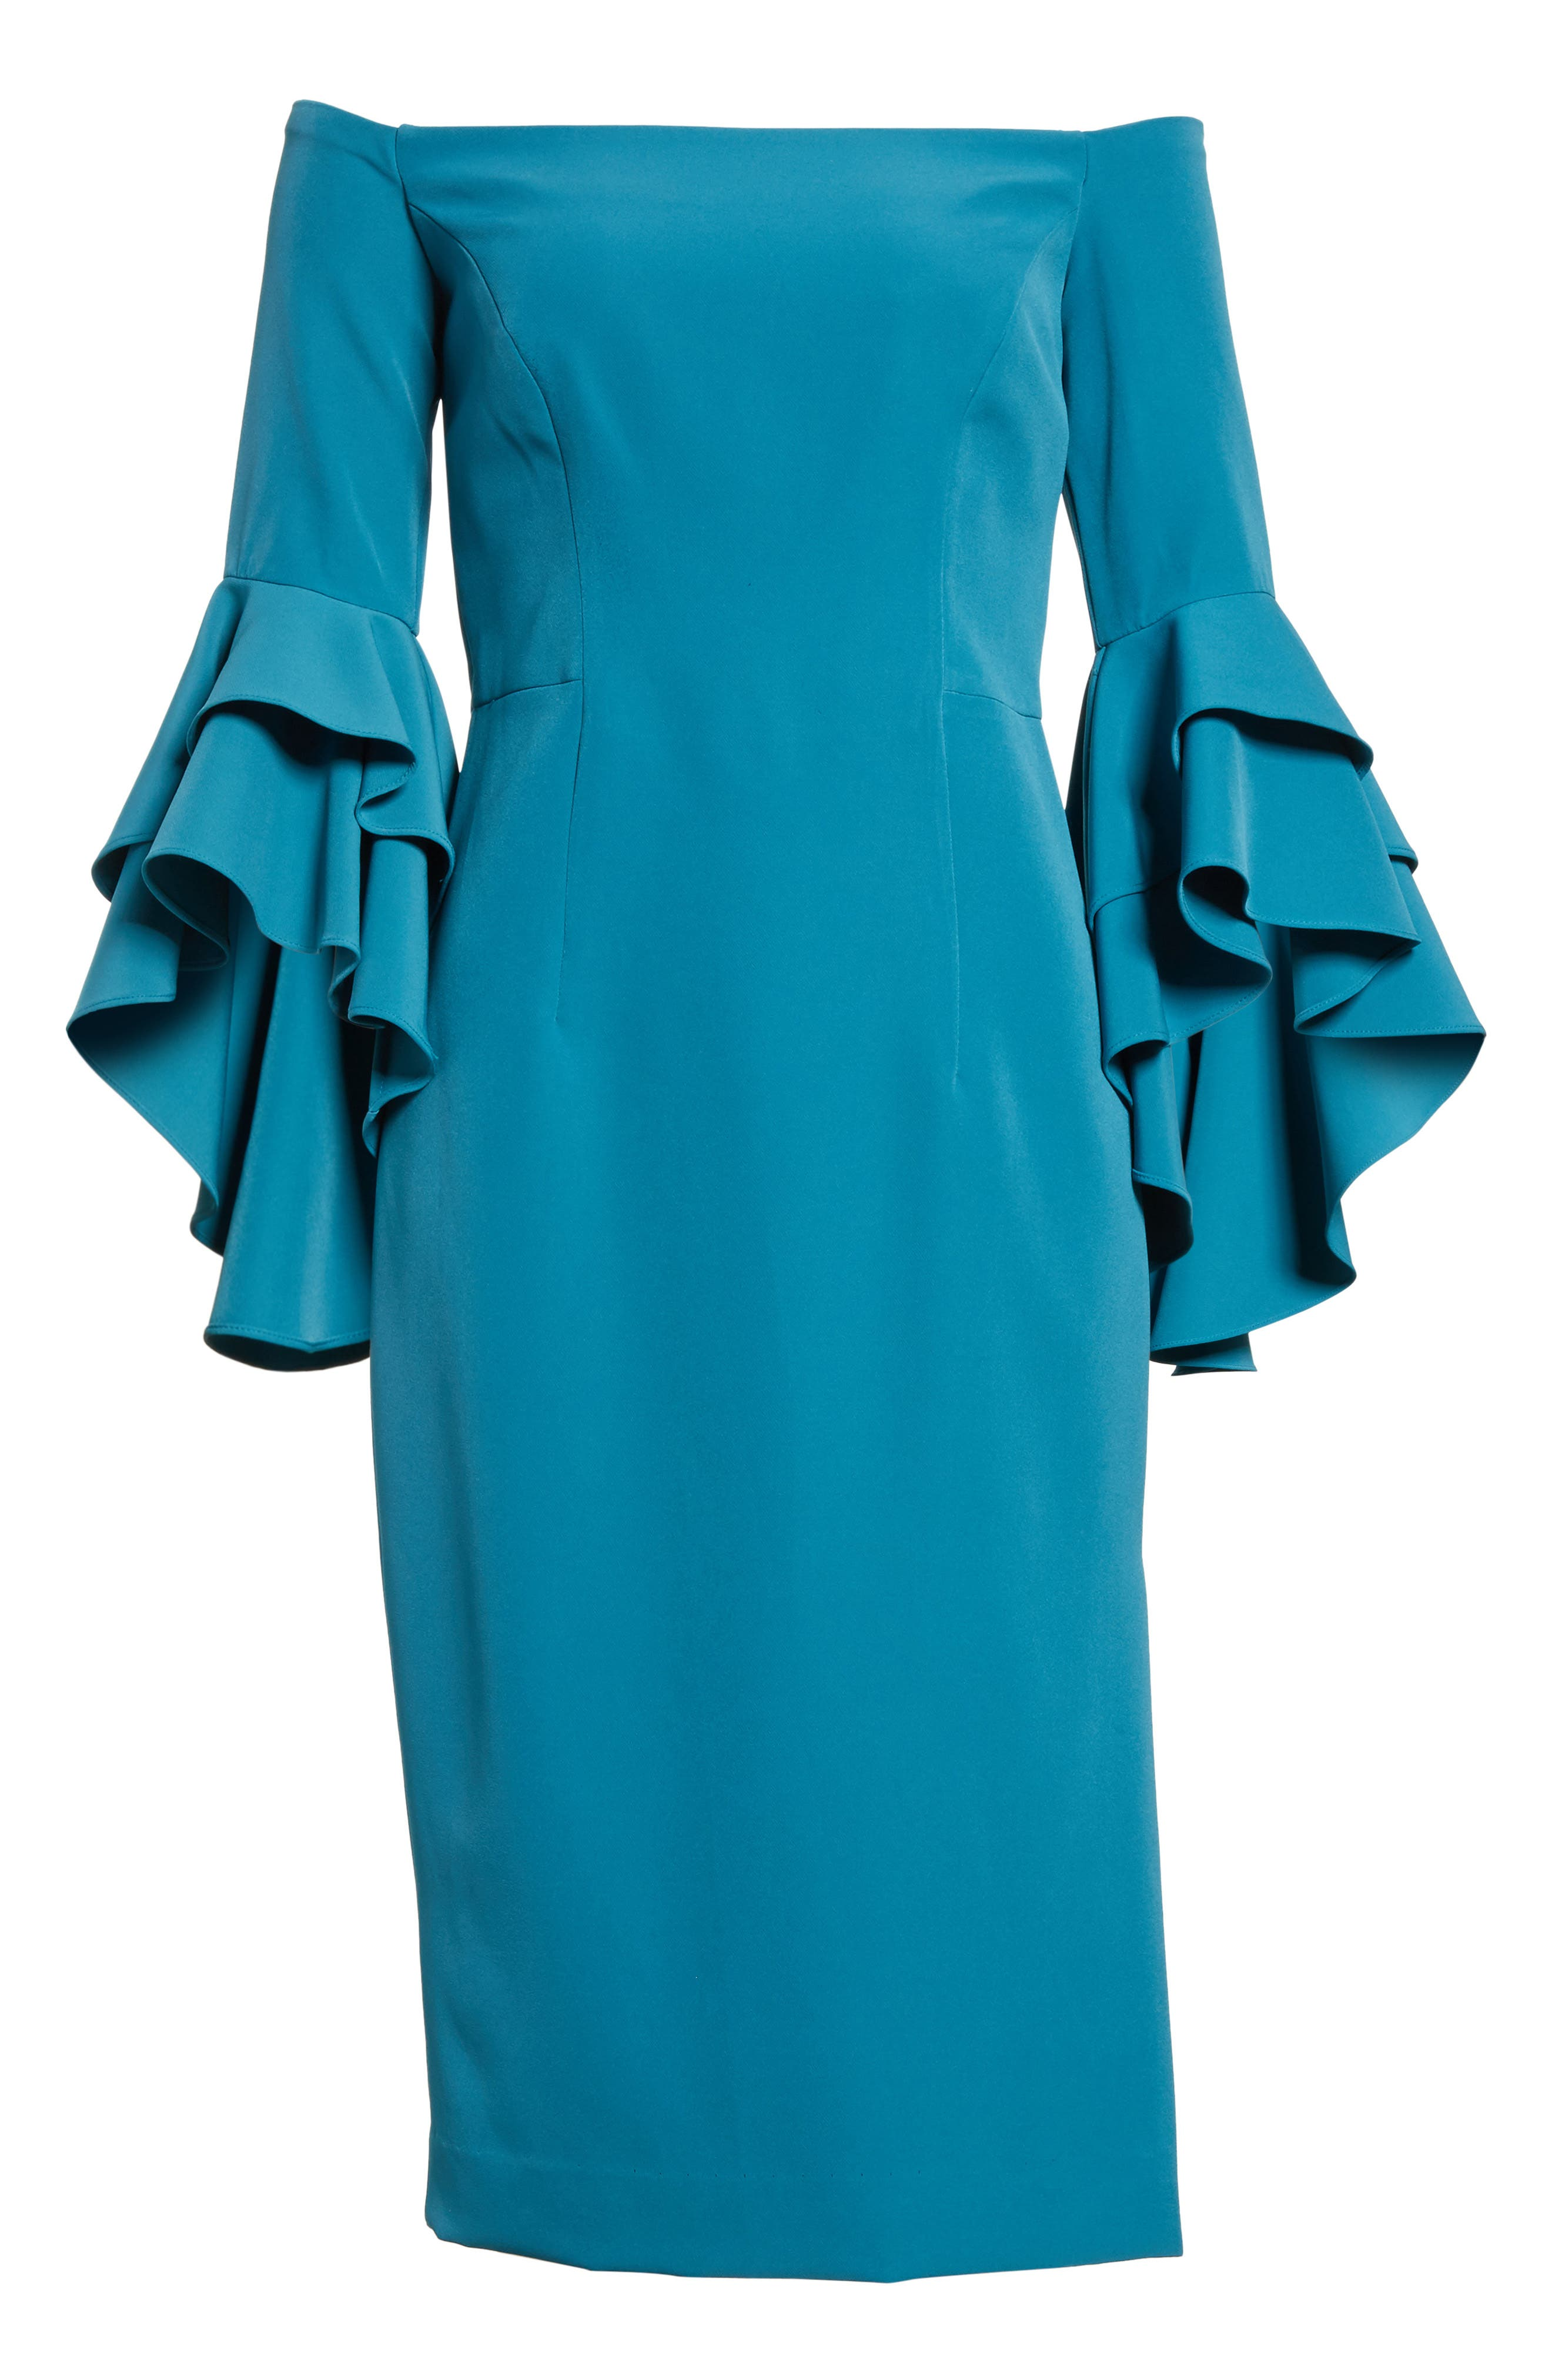 MILLY, Selena Off the Shoulder Midi Dress, Alternate thumbnail 6, color, 442